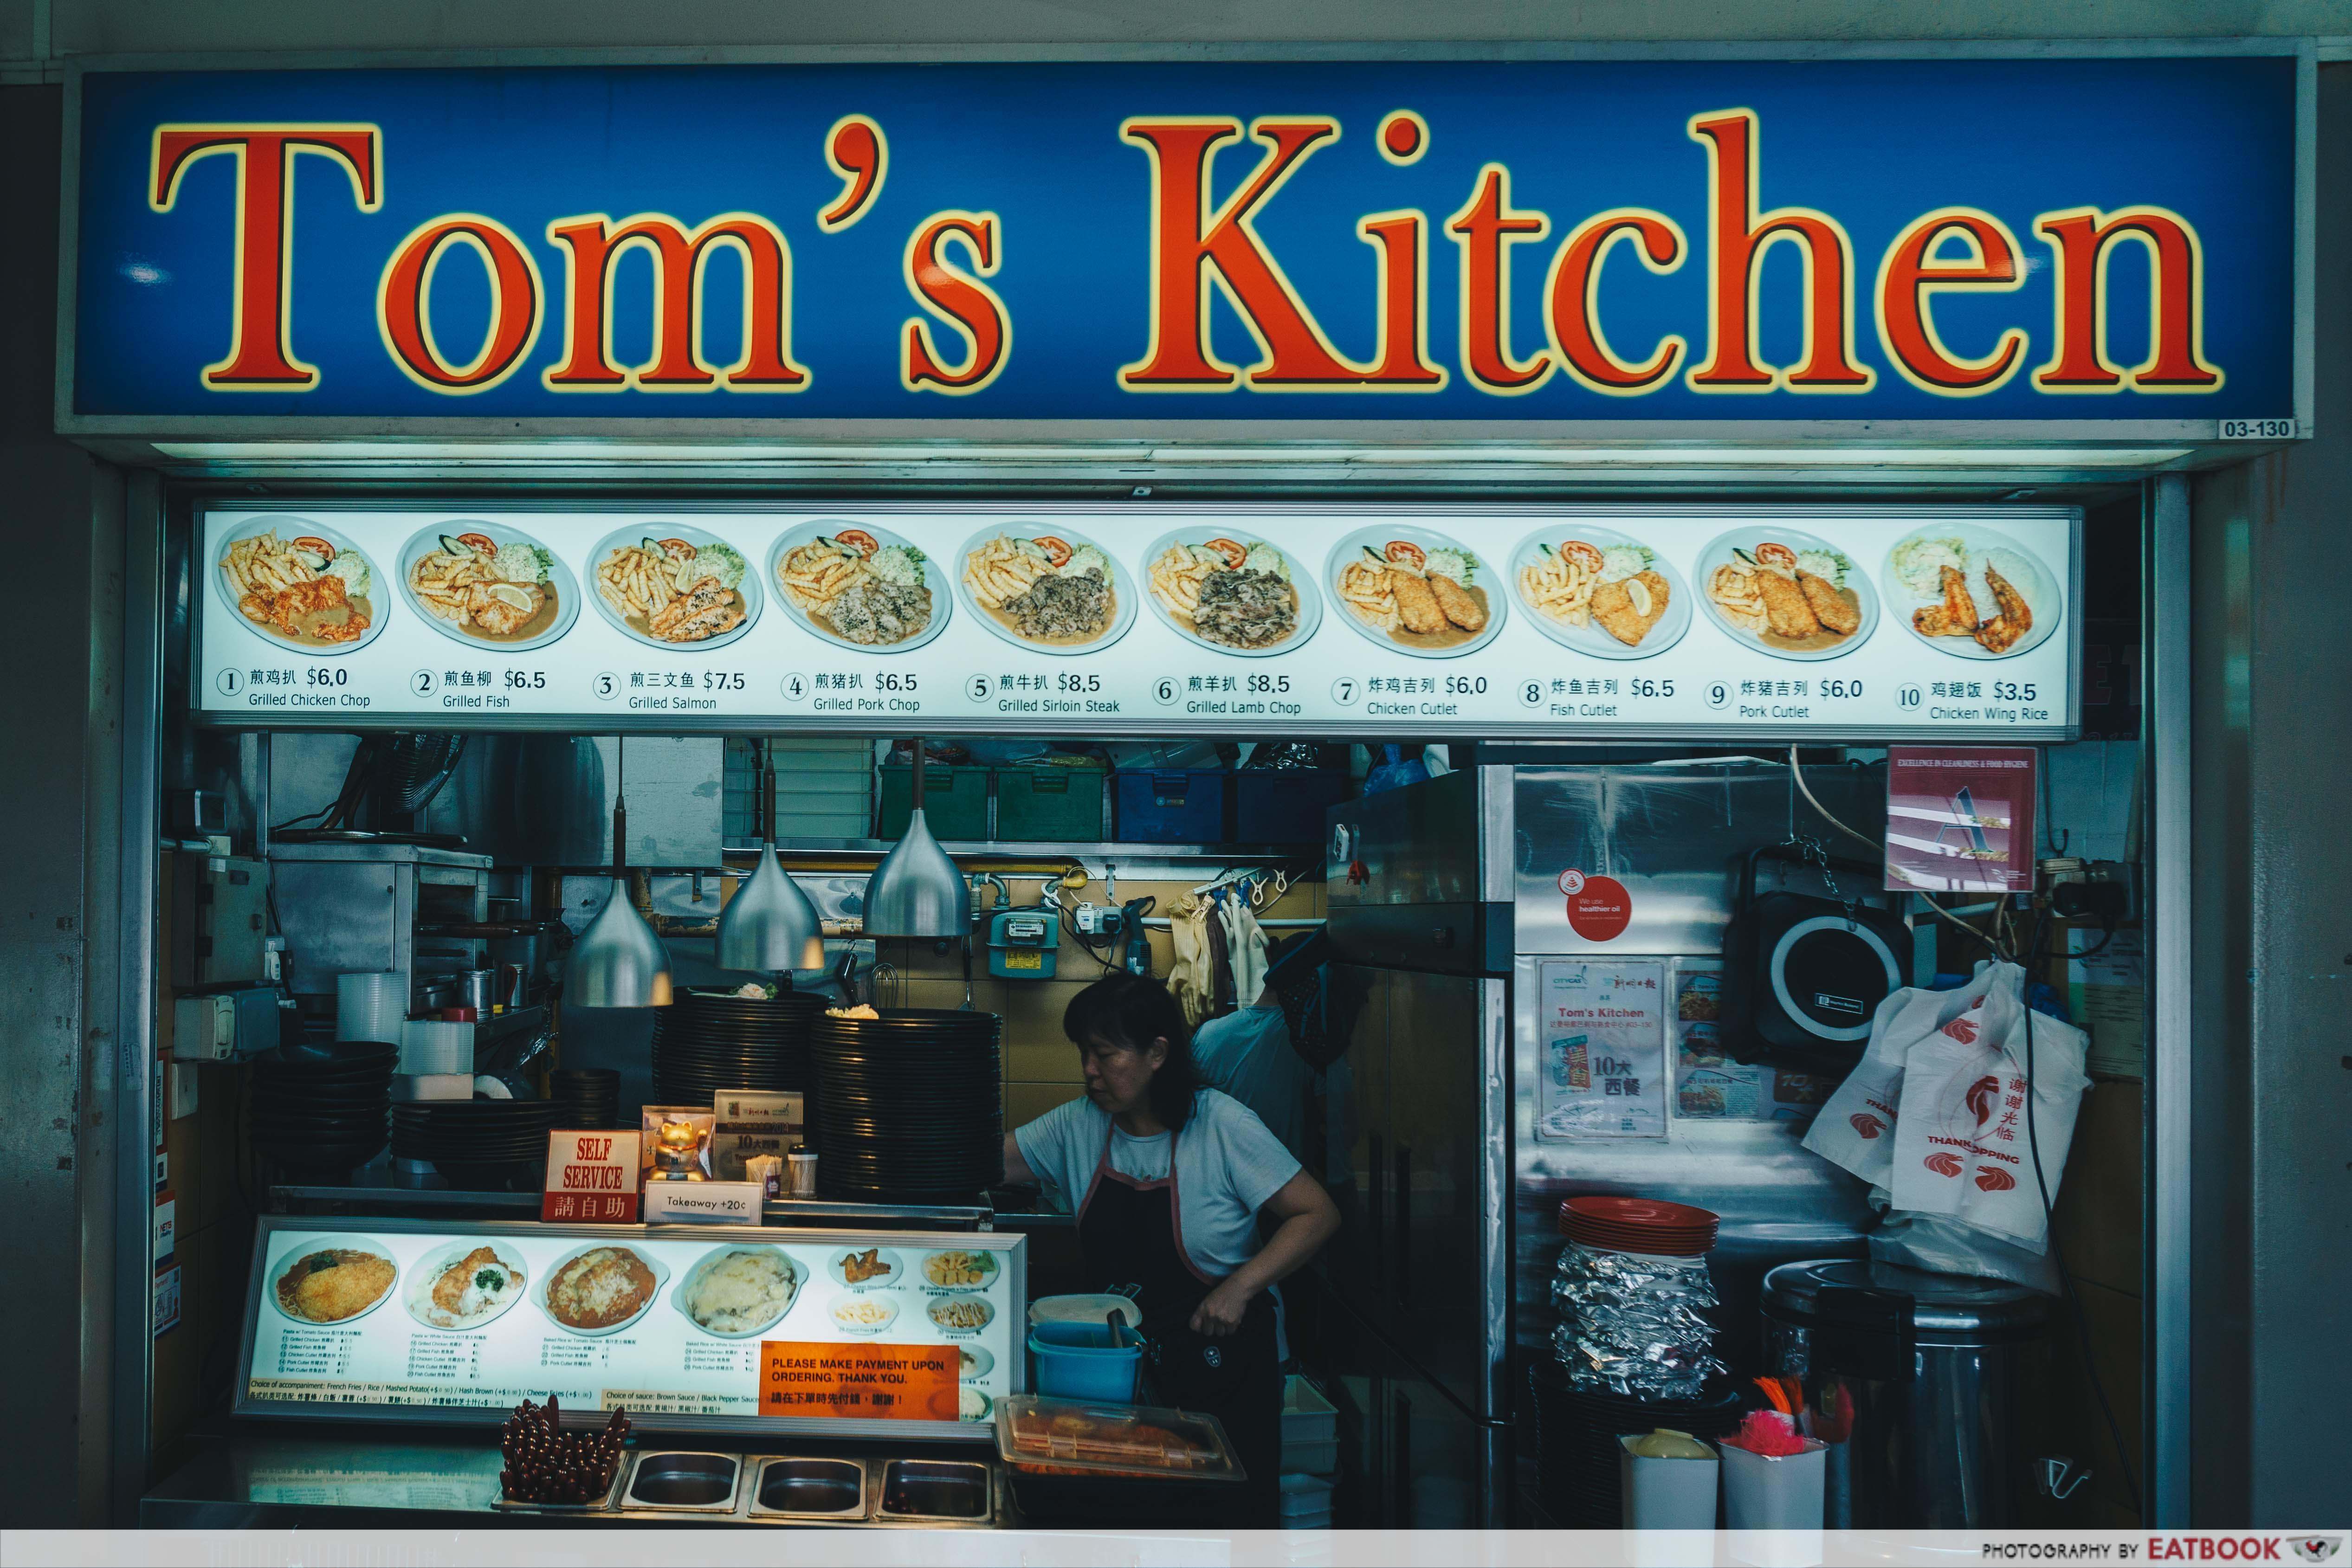 Tom's Kitchen - storefront